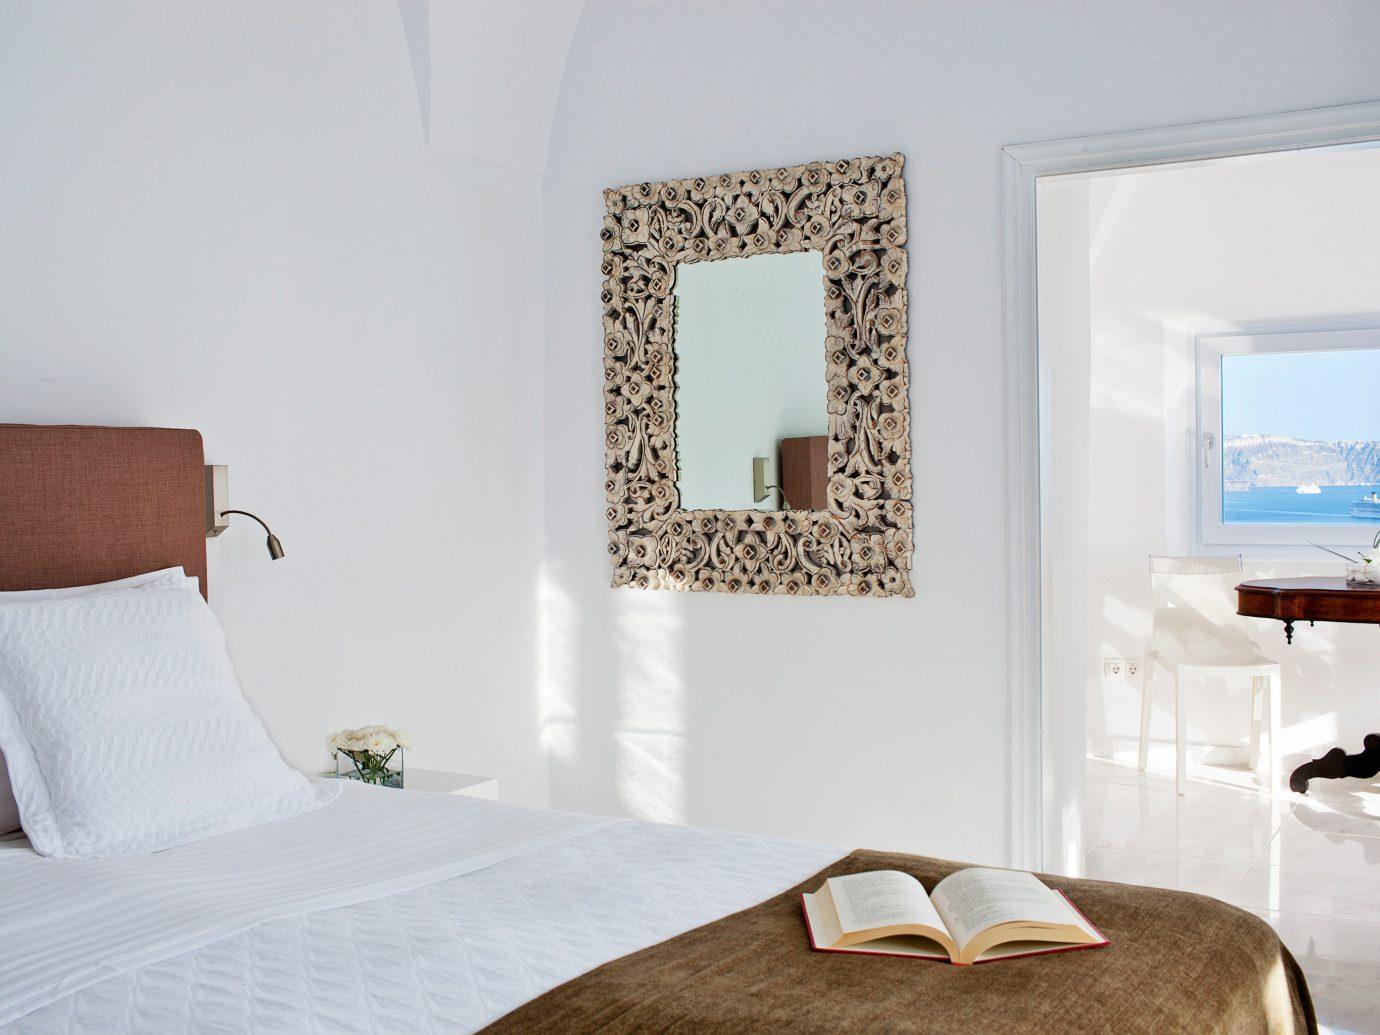 Bedroom Elegant Historic Honeymoon Hotels Scenic views Waterfront indoor wall bed room property pillow Suite scene interior design floor hotel furniture home living room Design cottage bed sheet apartment